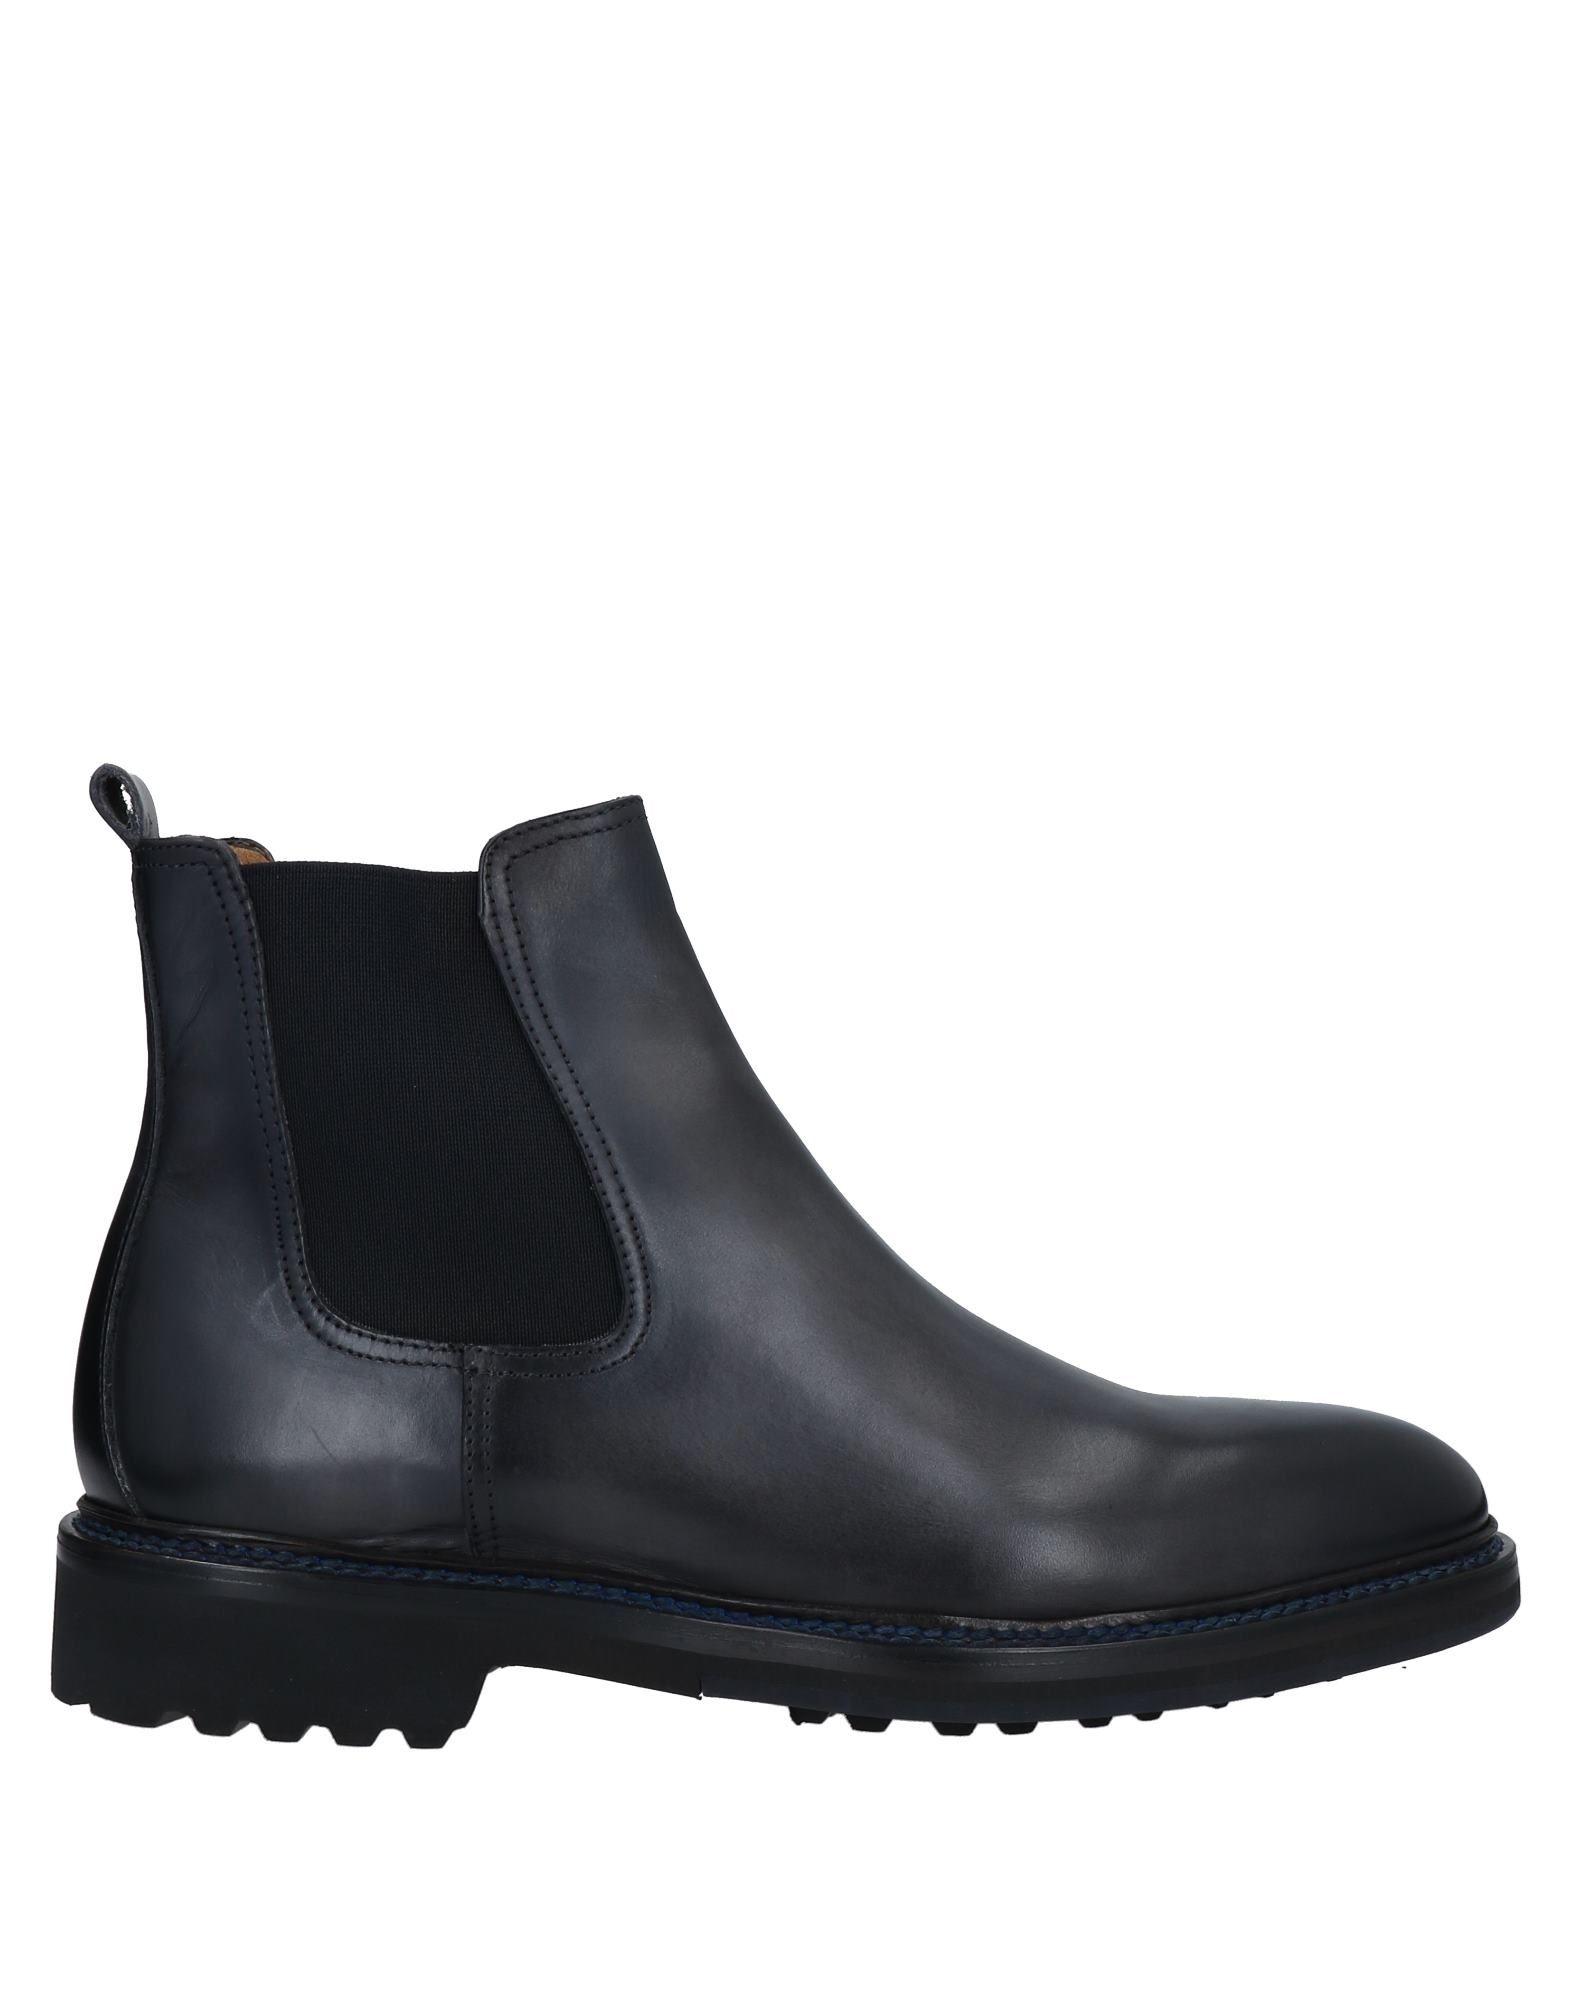 TROFEO by STEFANO BRANCHINI Полусапоги и высокие ботинки trofeo by stefano branchini обувь на шнурках